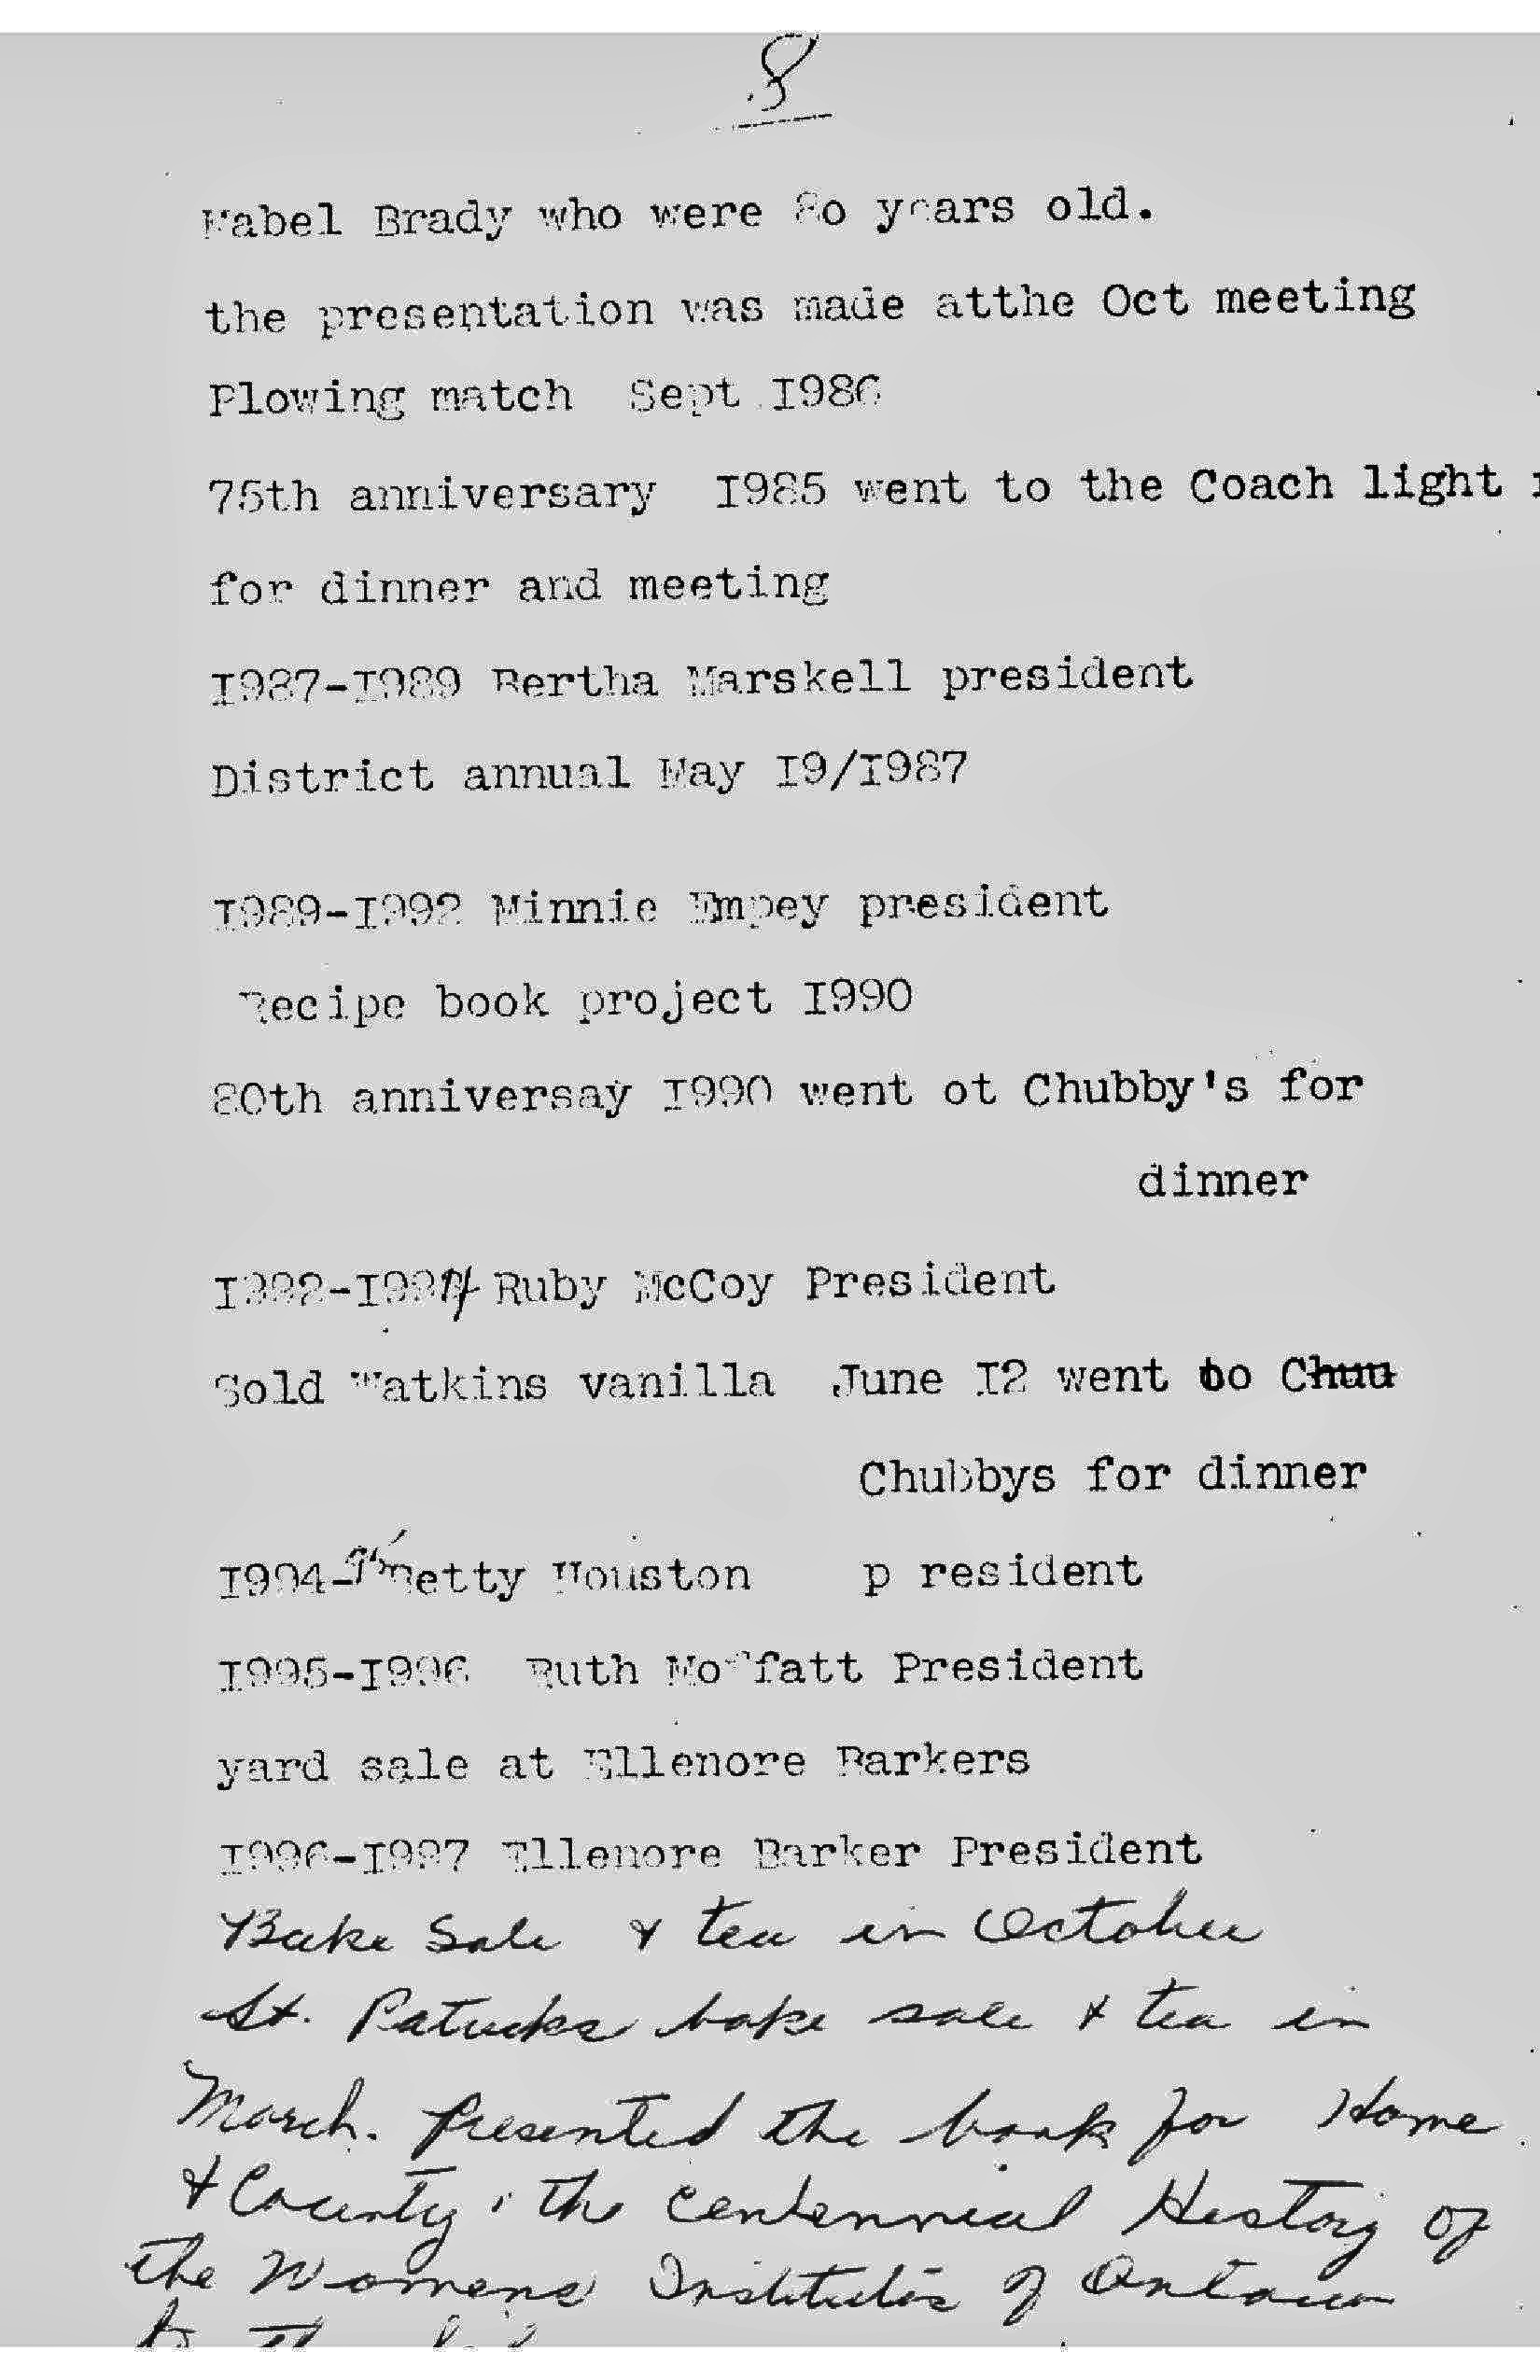 Women's Institute History of the past 86 years 008.jpg